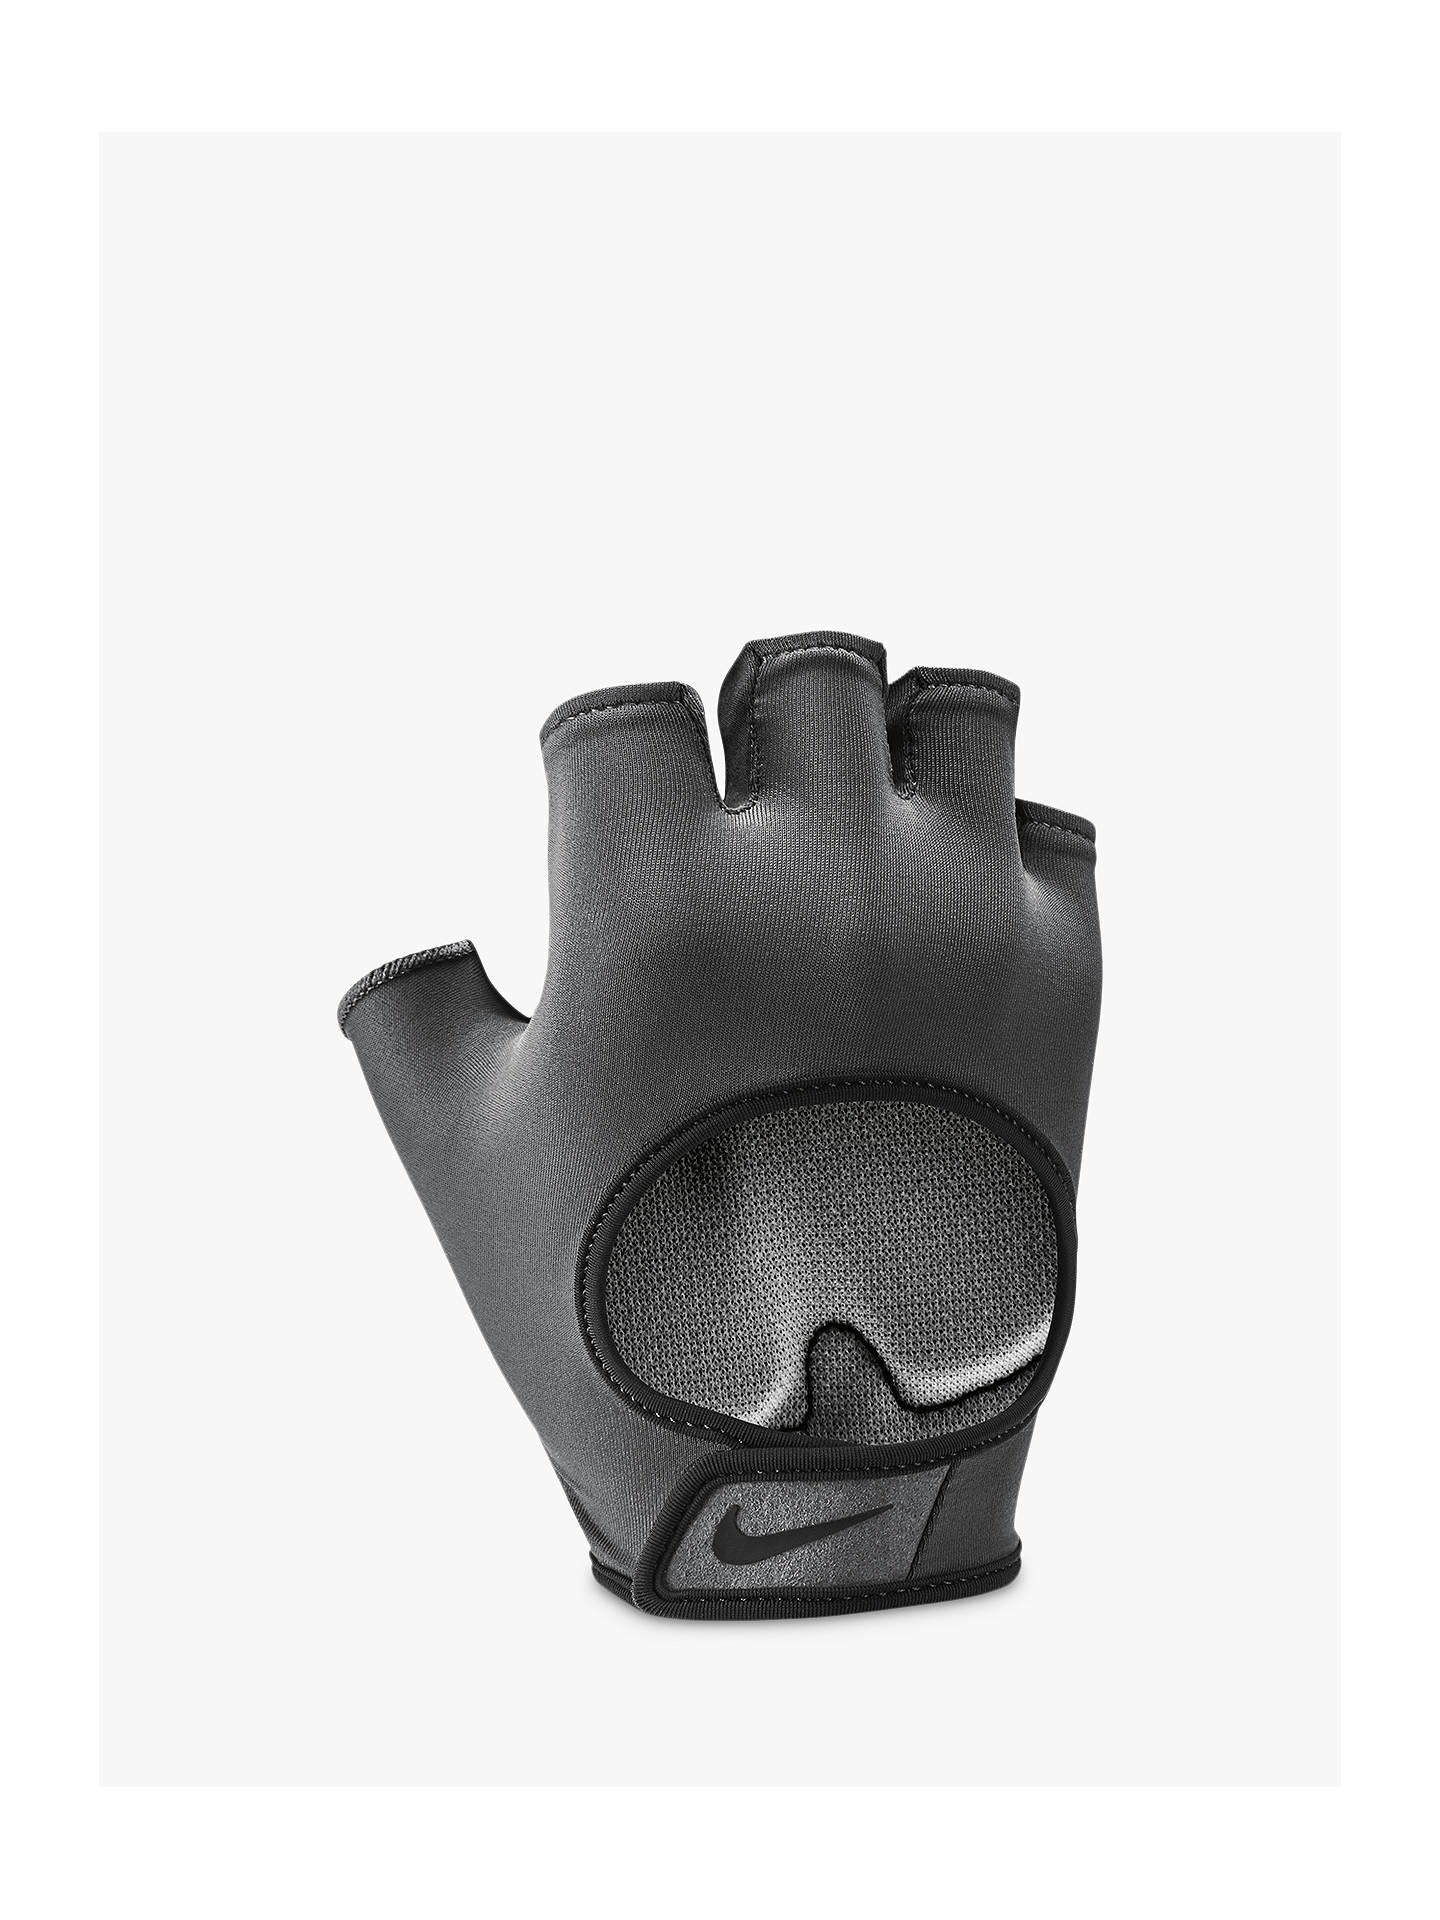 716ba3bec0 ... Buy Nike Gym Ultimate Women's Training Gloves, Anthracite/Black, M  Online at johnlewis ...